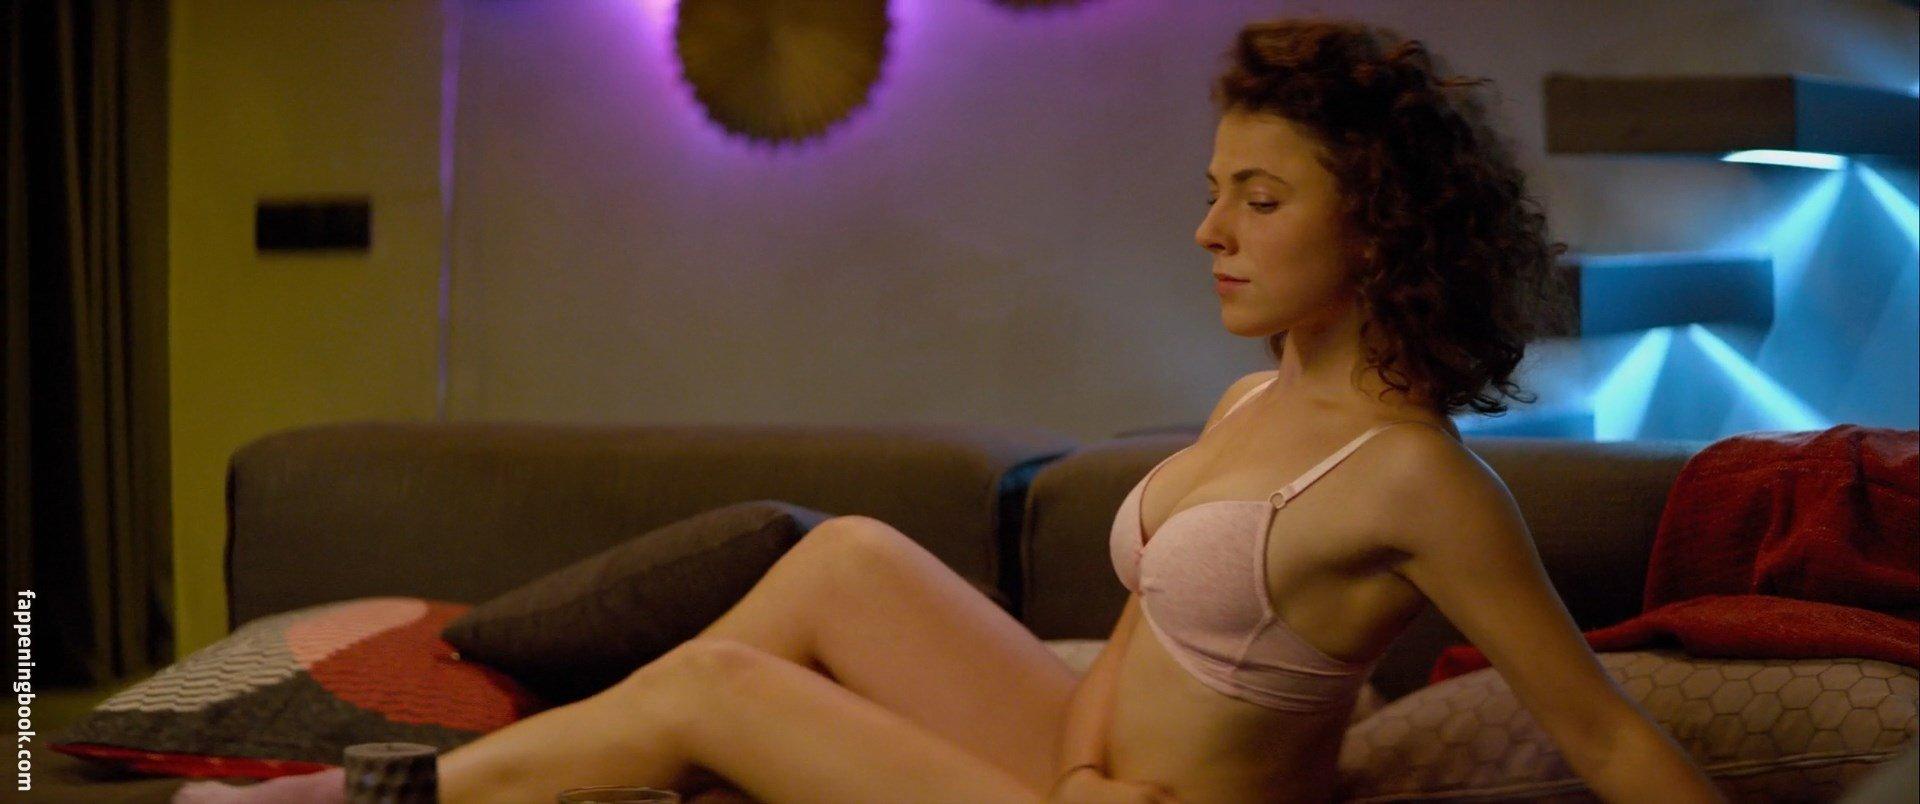 Yasmina Omerovich Nude